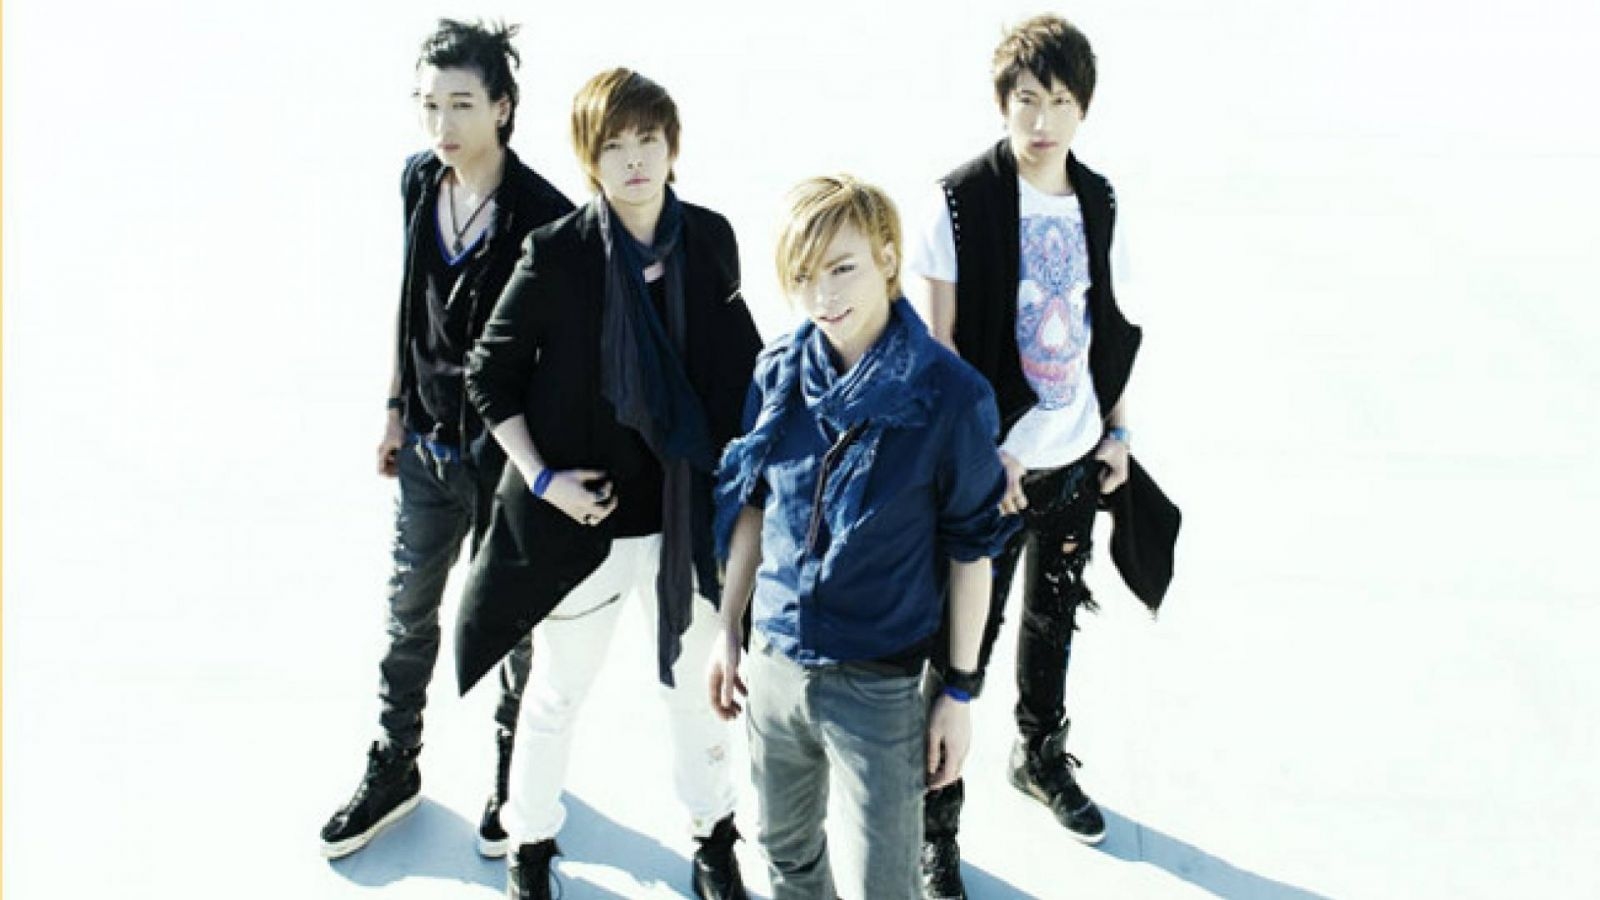 Rock-yhtye Guyz julkaisee uuden singlen © PRIMROSE Entertainment